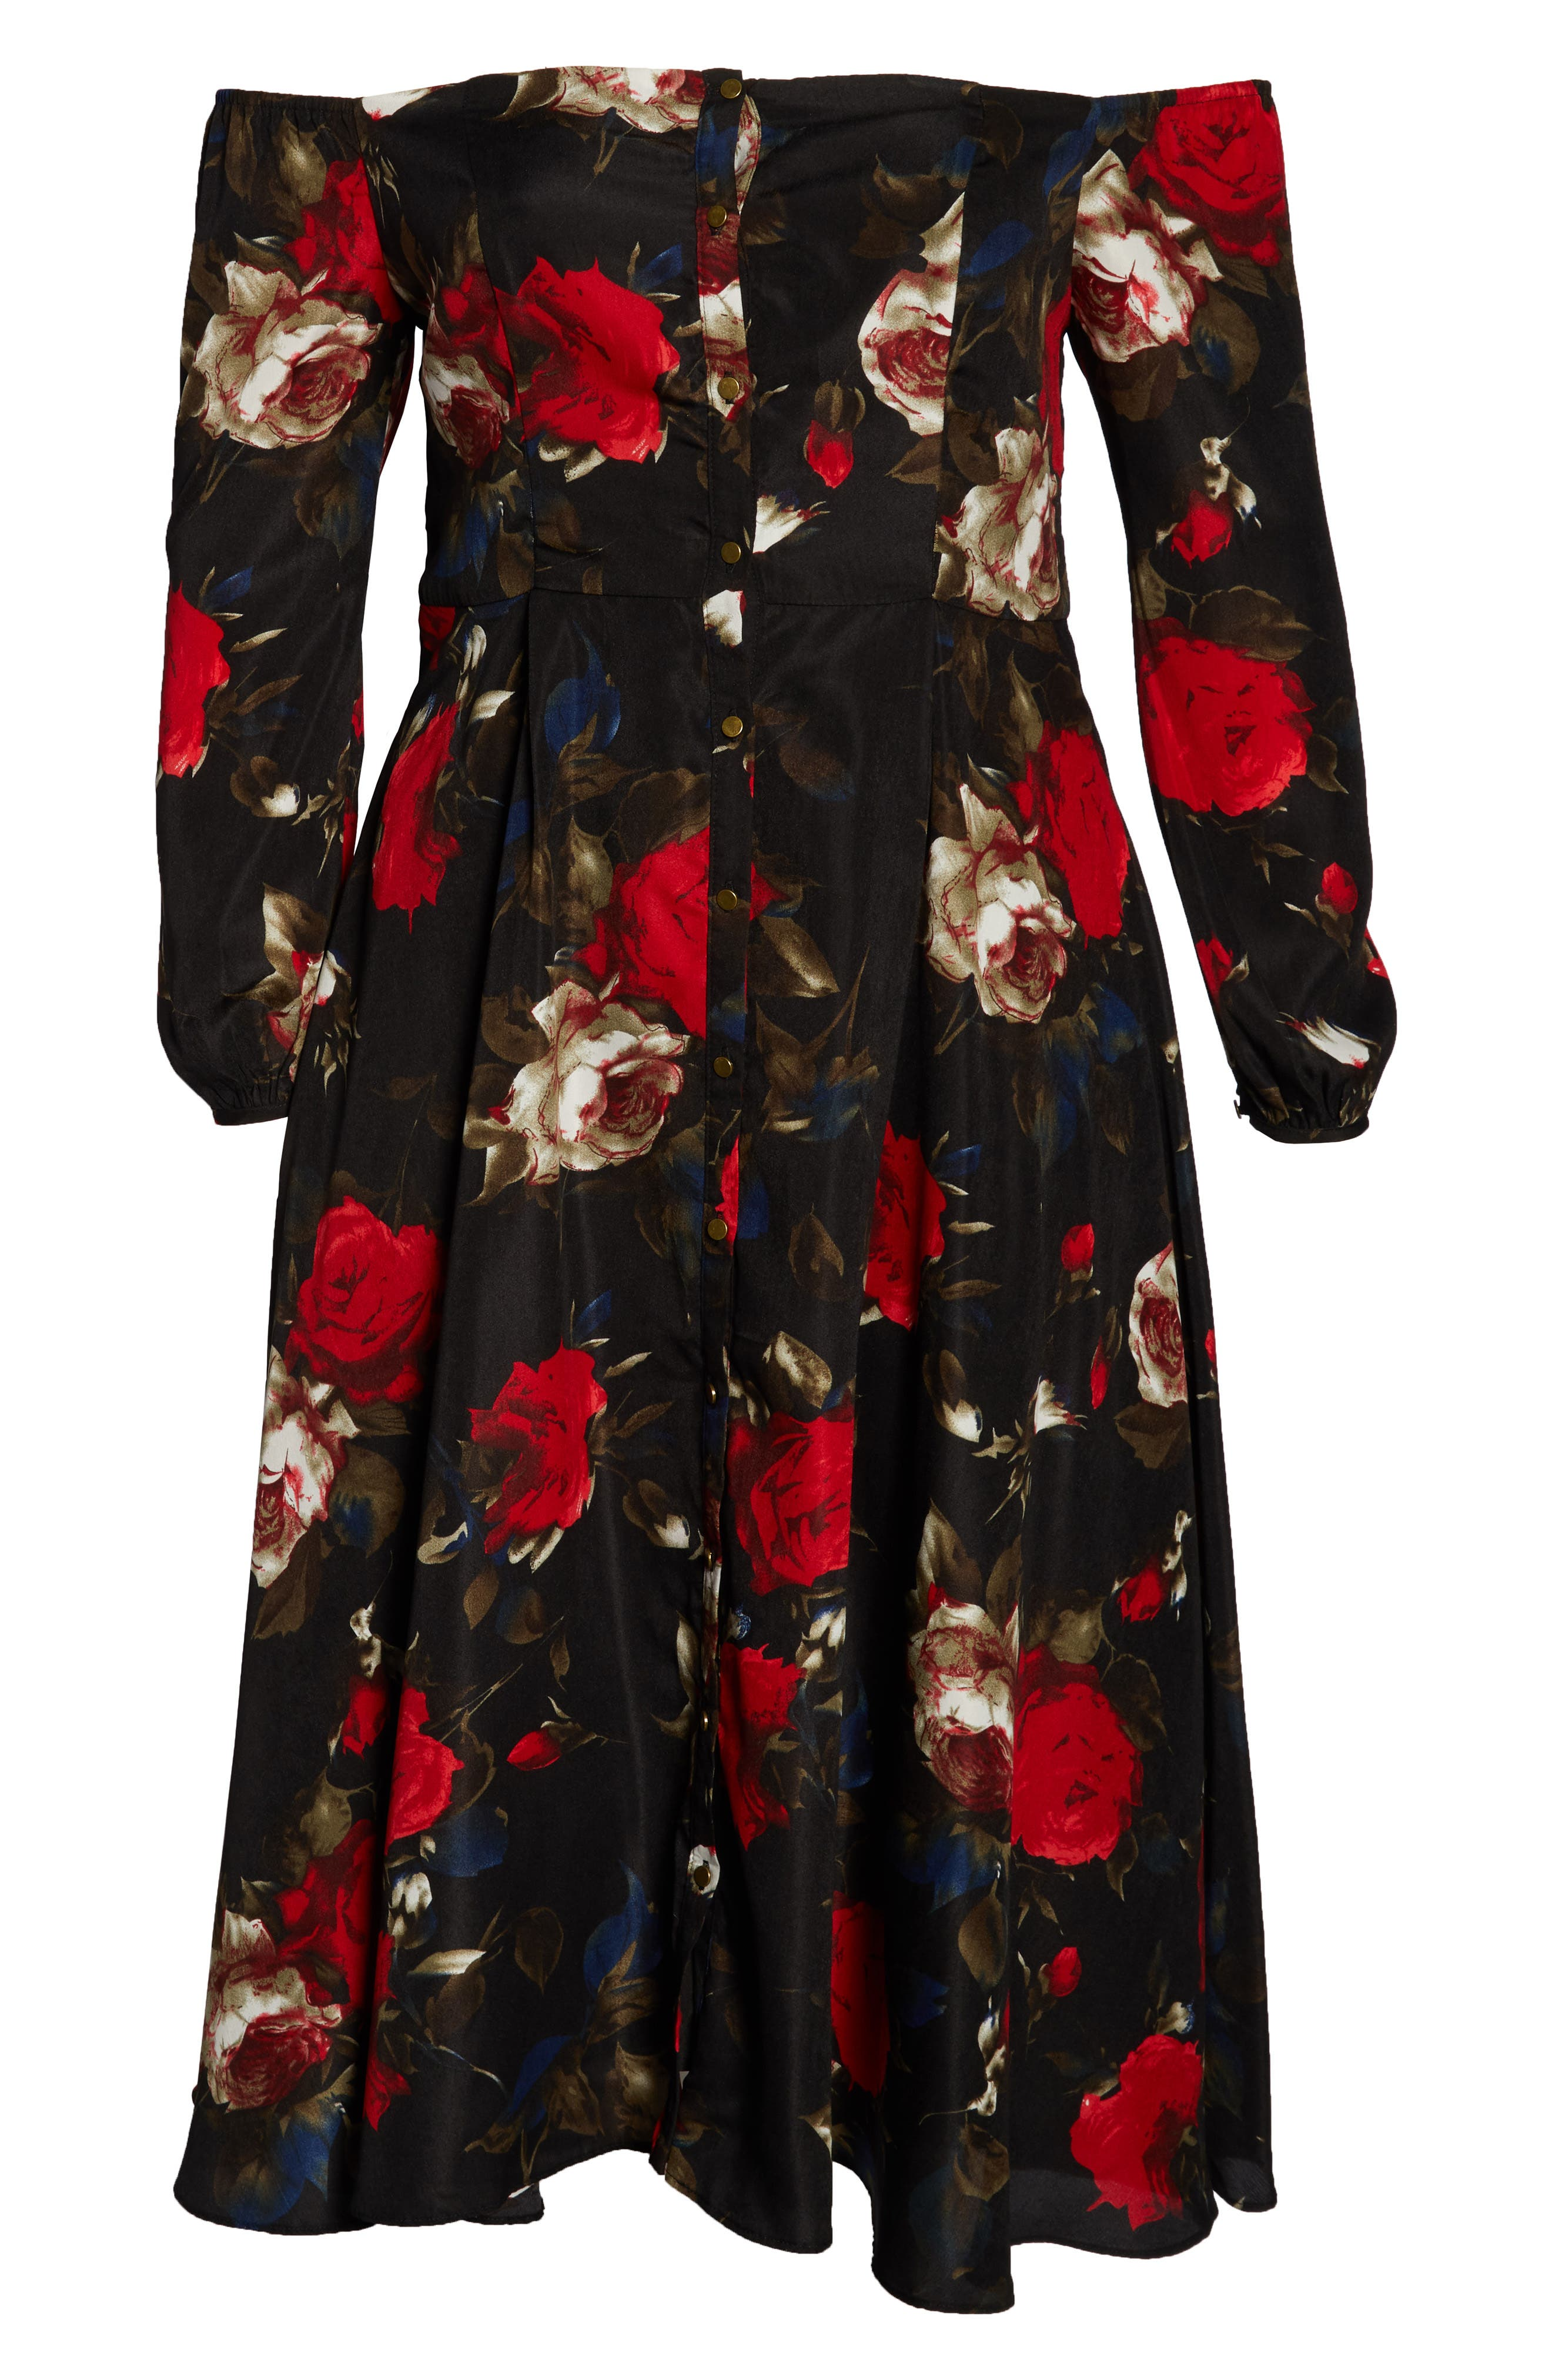 Off the Shoulder Midi Dress,                             Alternate thumbnail 13, color,                             BLACK LUSH ROSE FLORAL